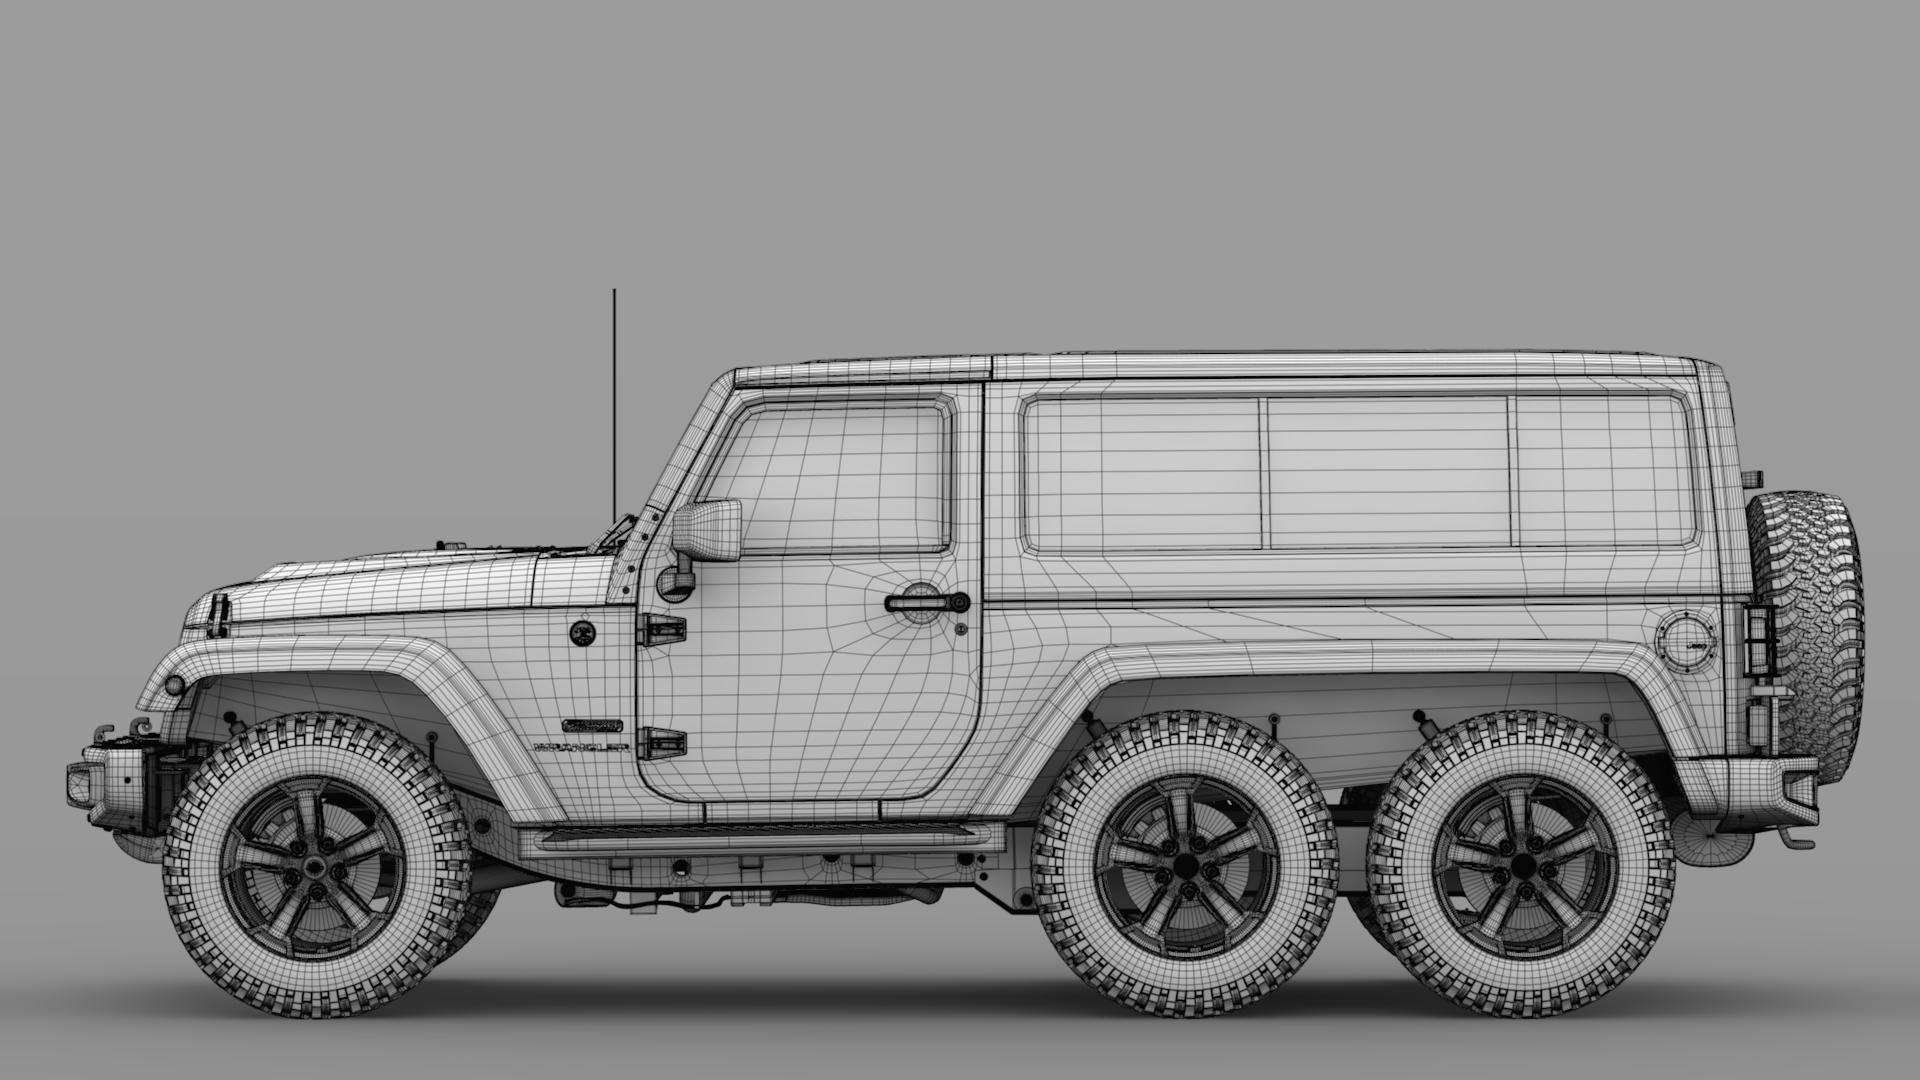 jeep wrangler 6×6 rubicon recon jk 2017 3d model max fbx c4d lwo ma mb hrc xsi obj 276855